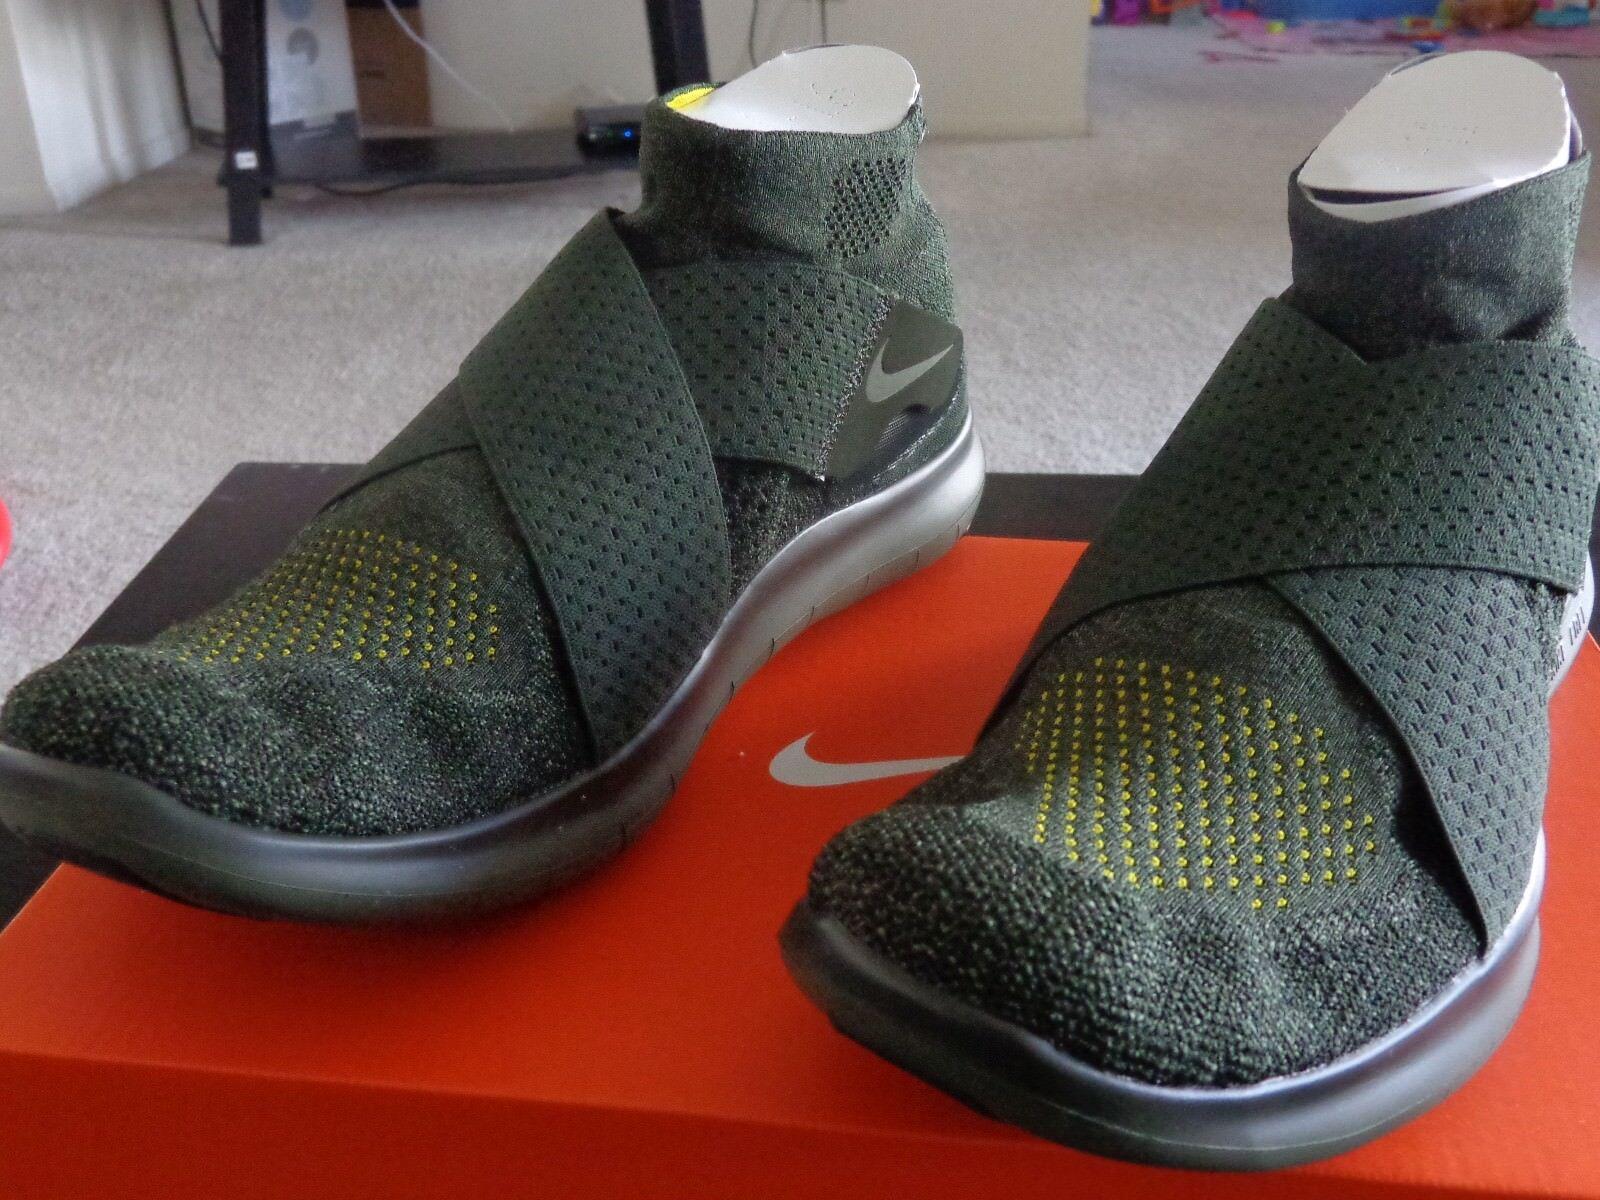 Nike free free Nike flyknit in bewegung.brandneu.100% authentische e6e5b8